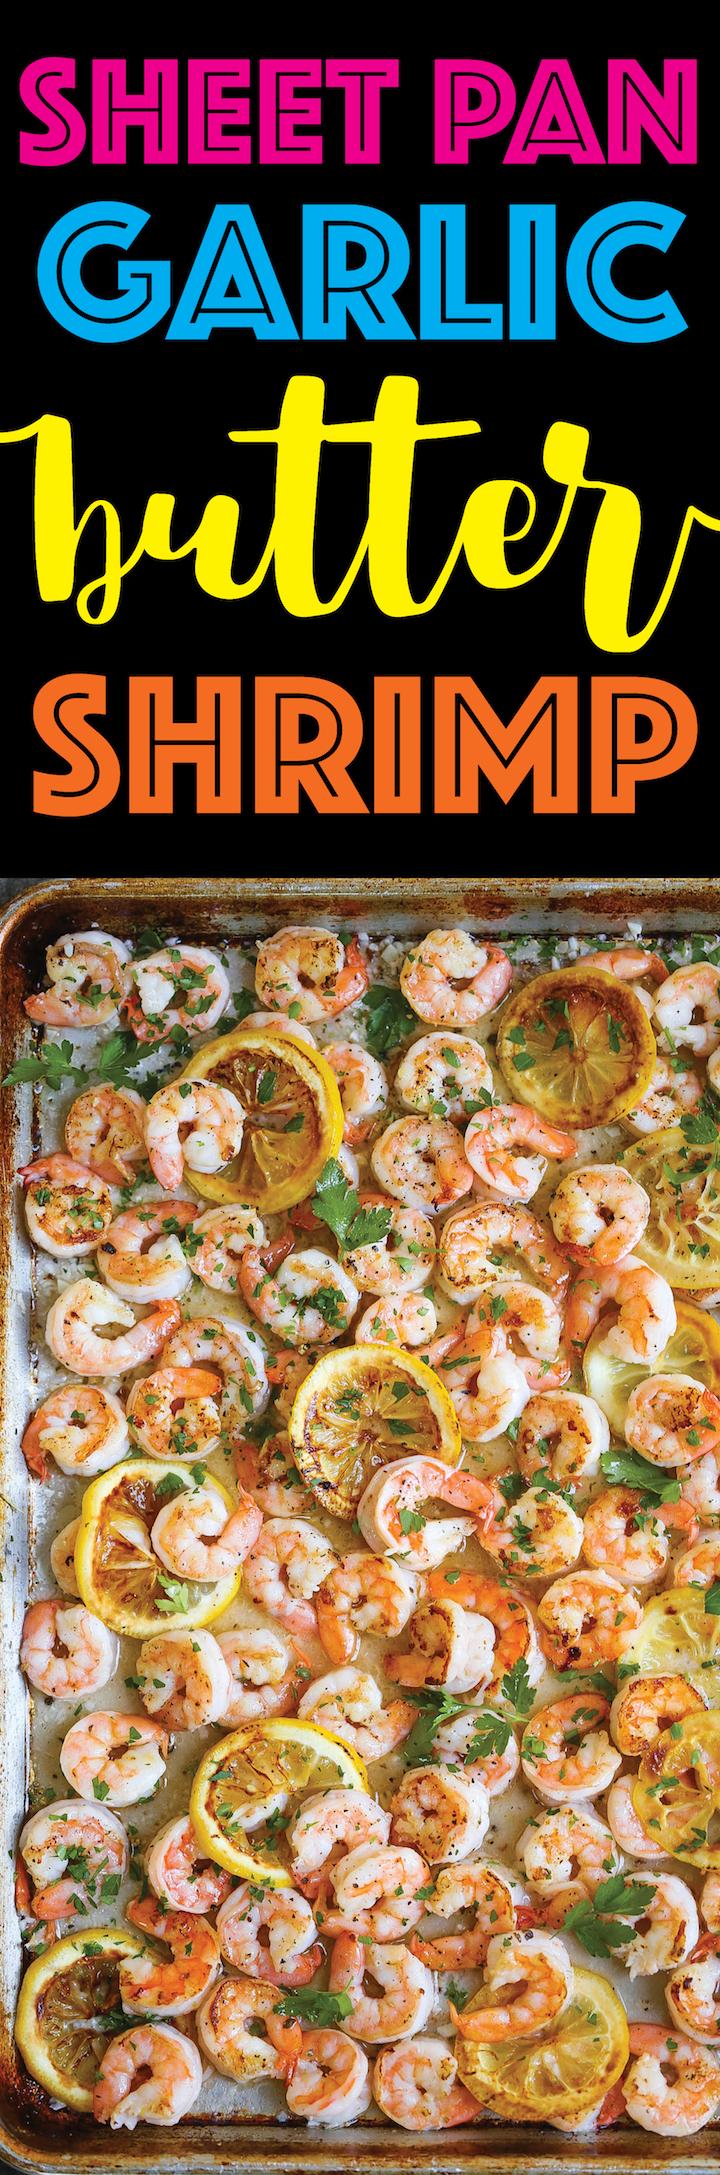 Sheet Pan Garlic Butter Shrimp